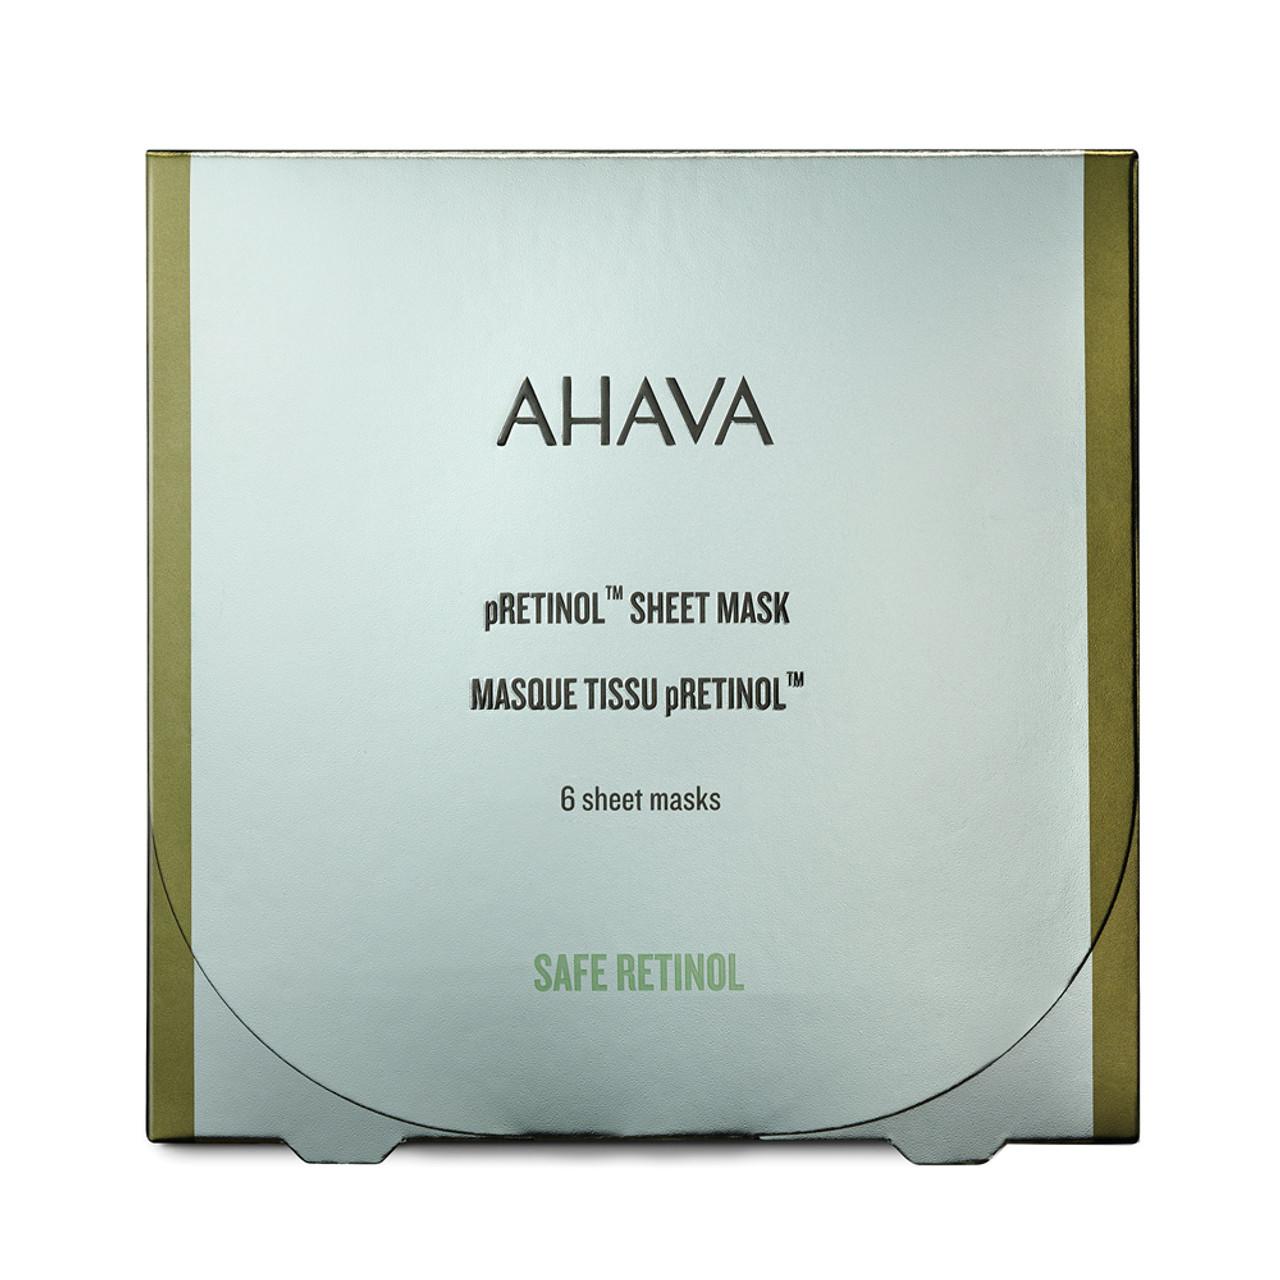 AHAVA pRetinol Sheet Mask (6-Pk)